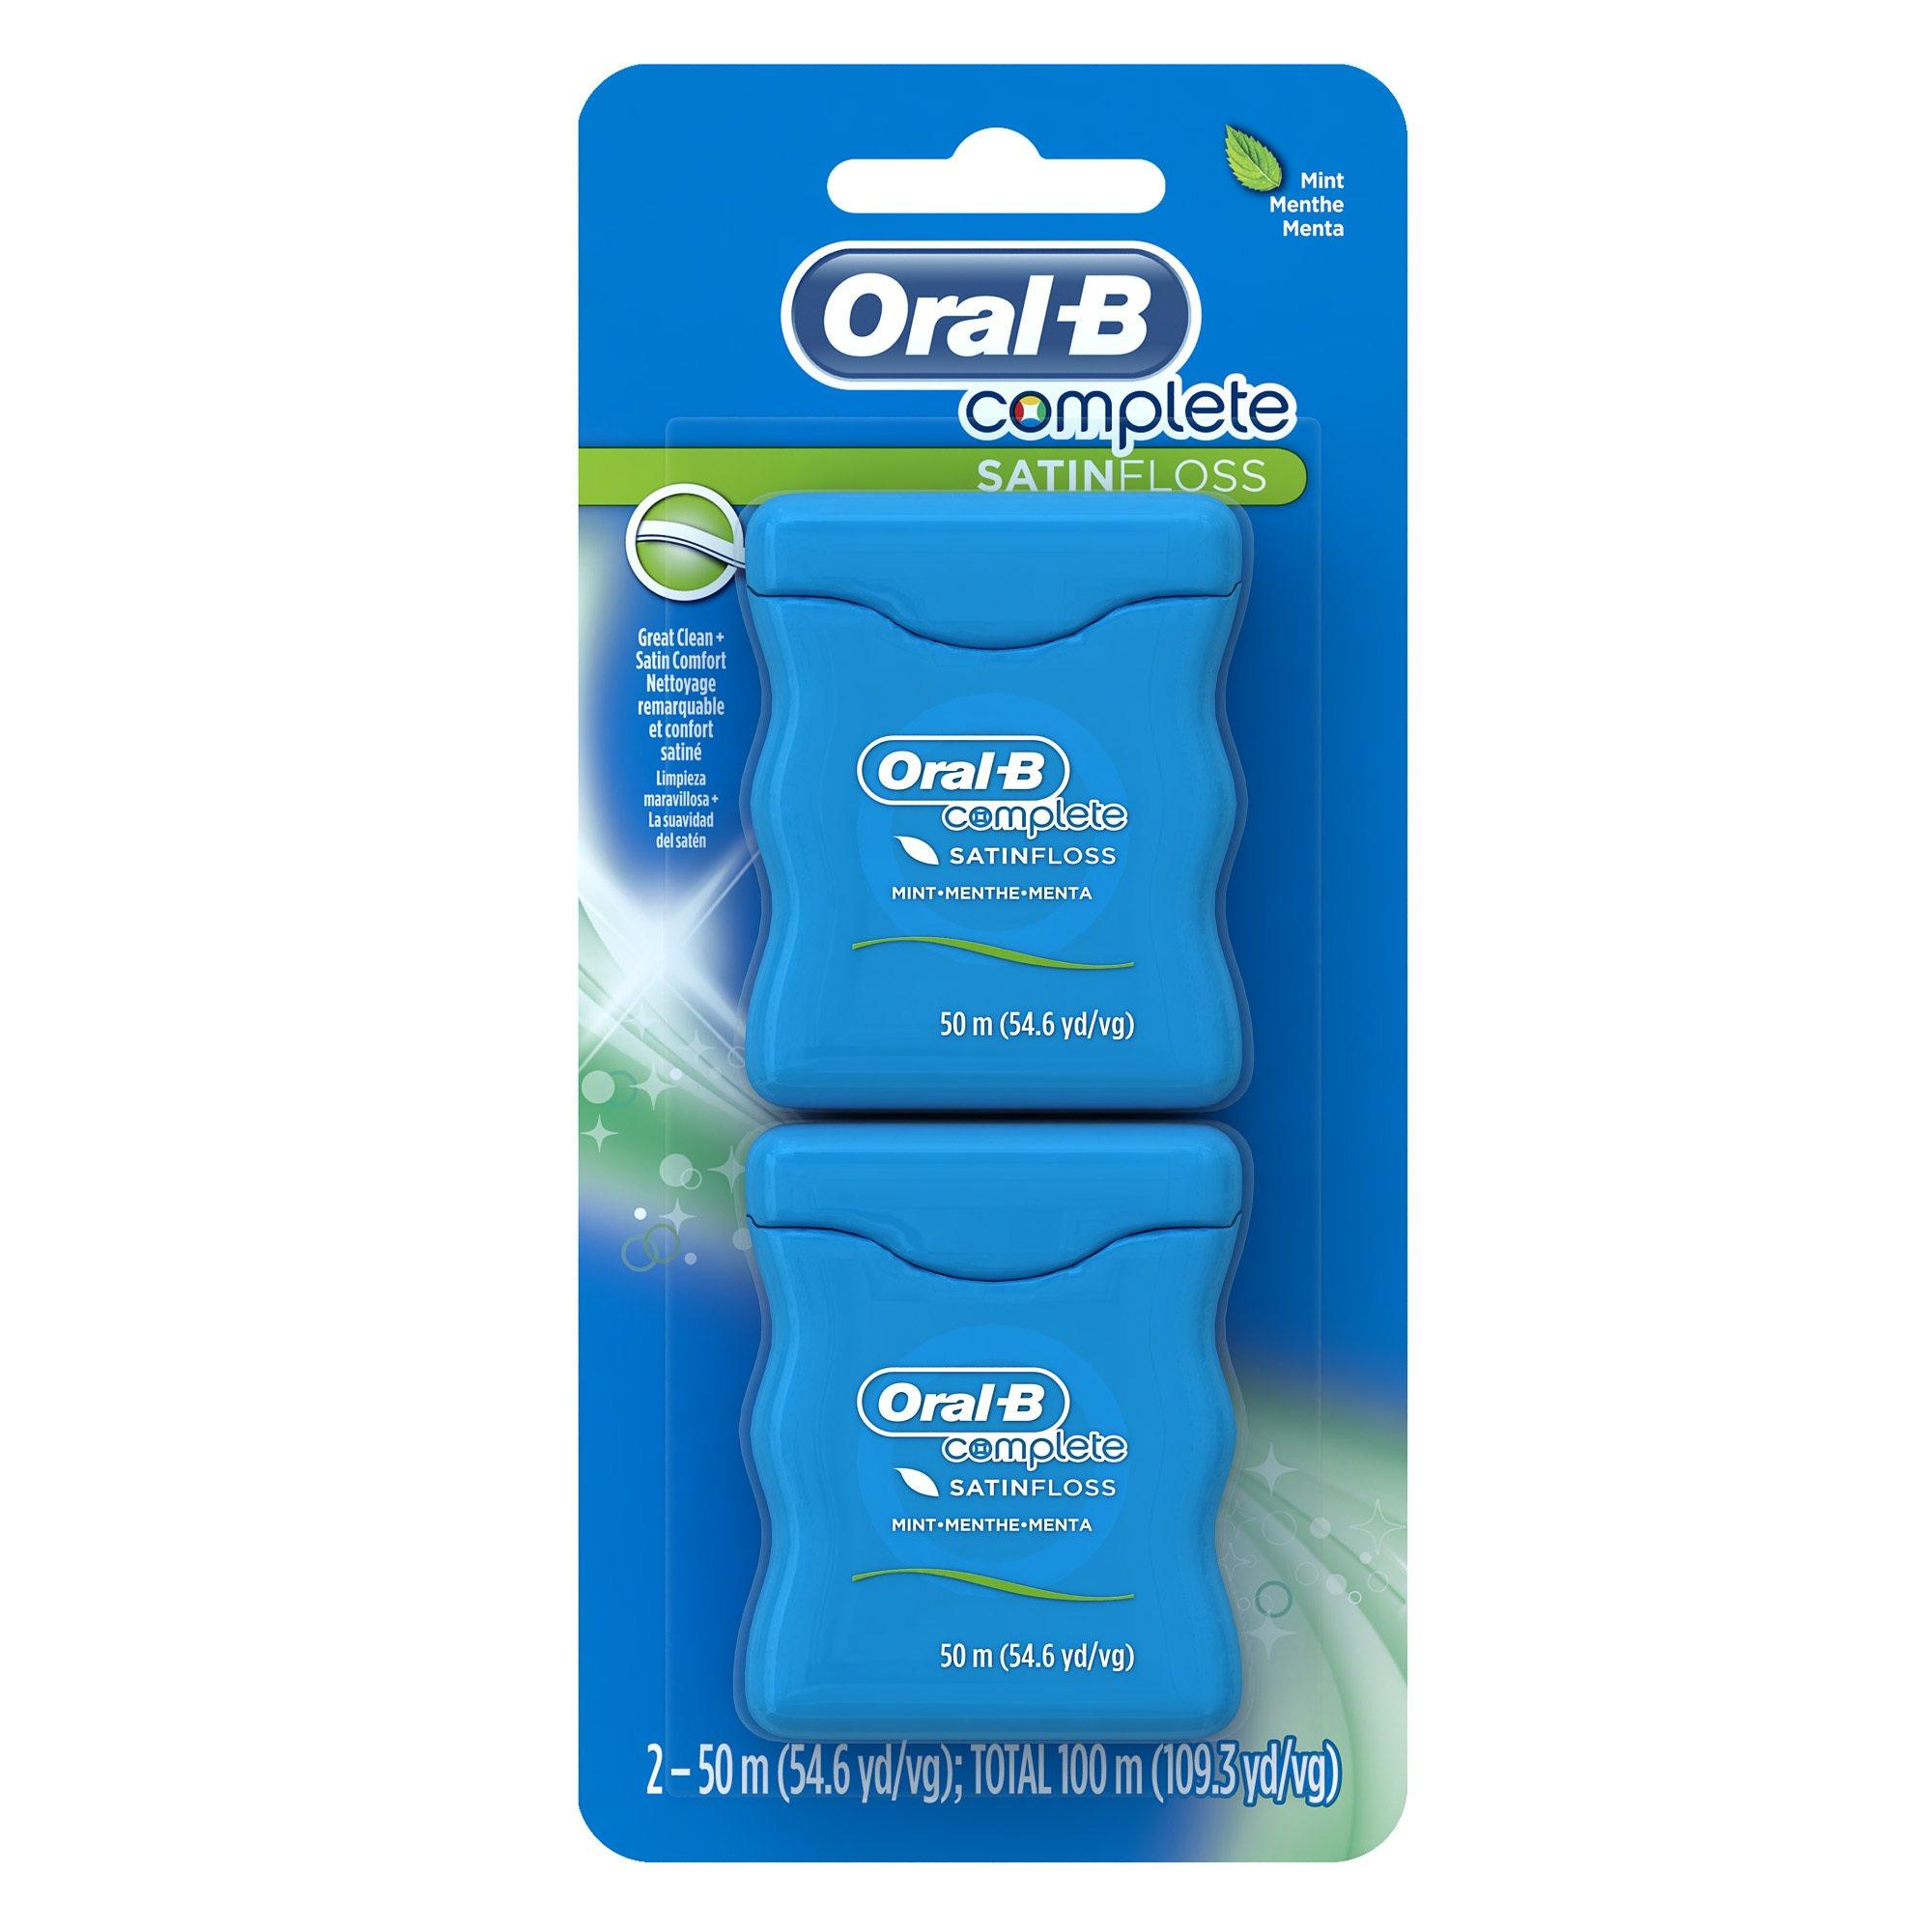 Oral B Complete Satin Dental Floss